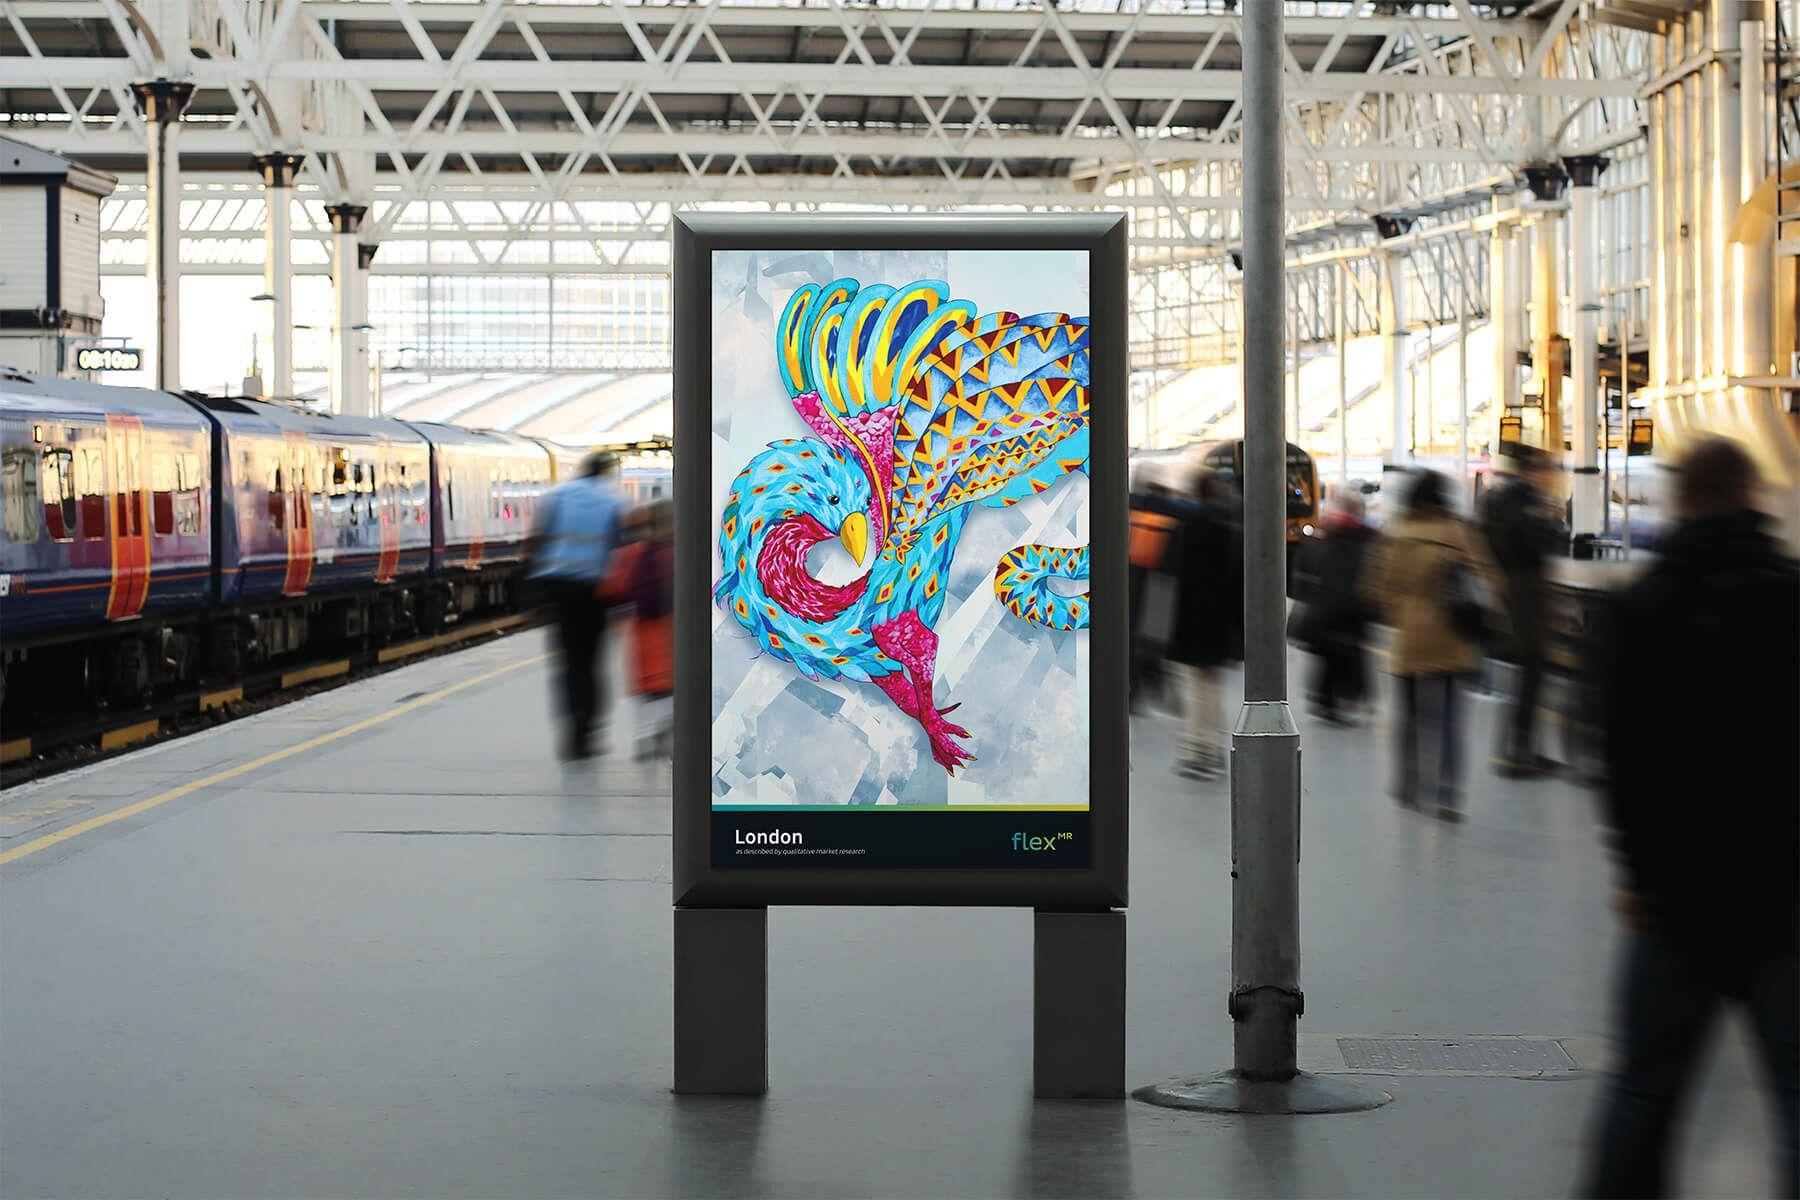 Press Photo - London Advert